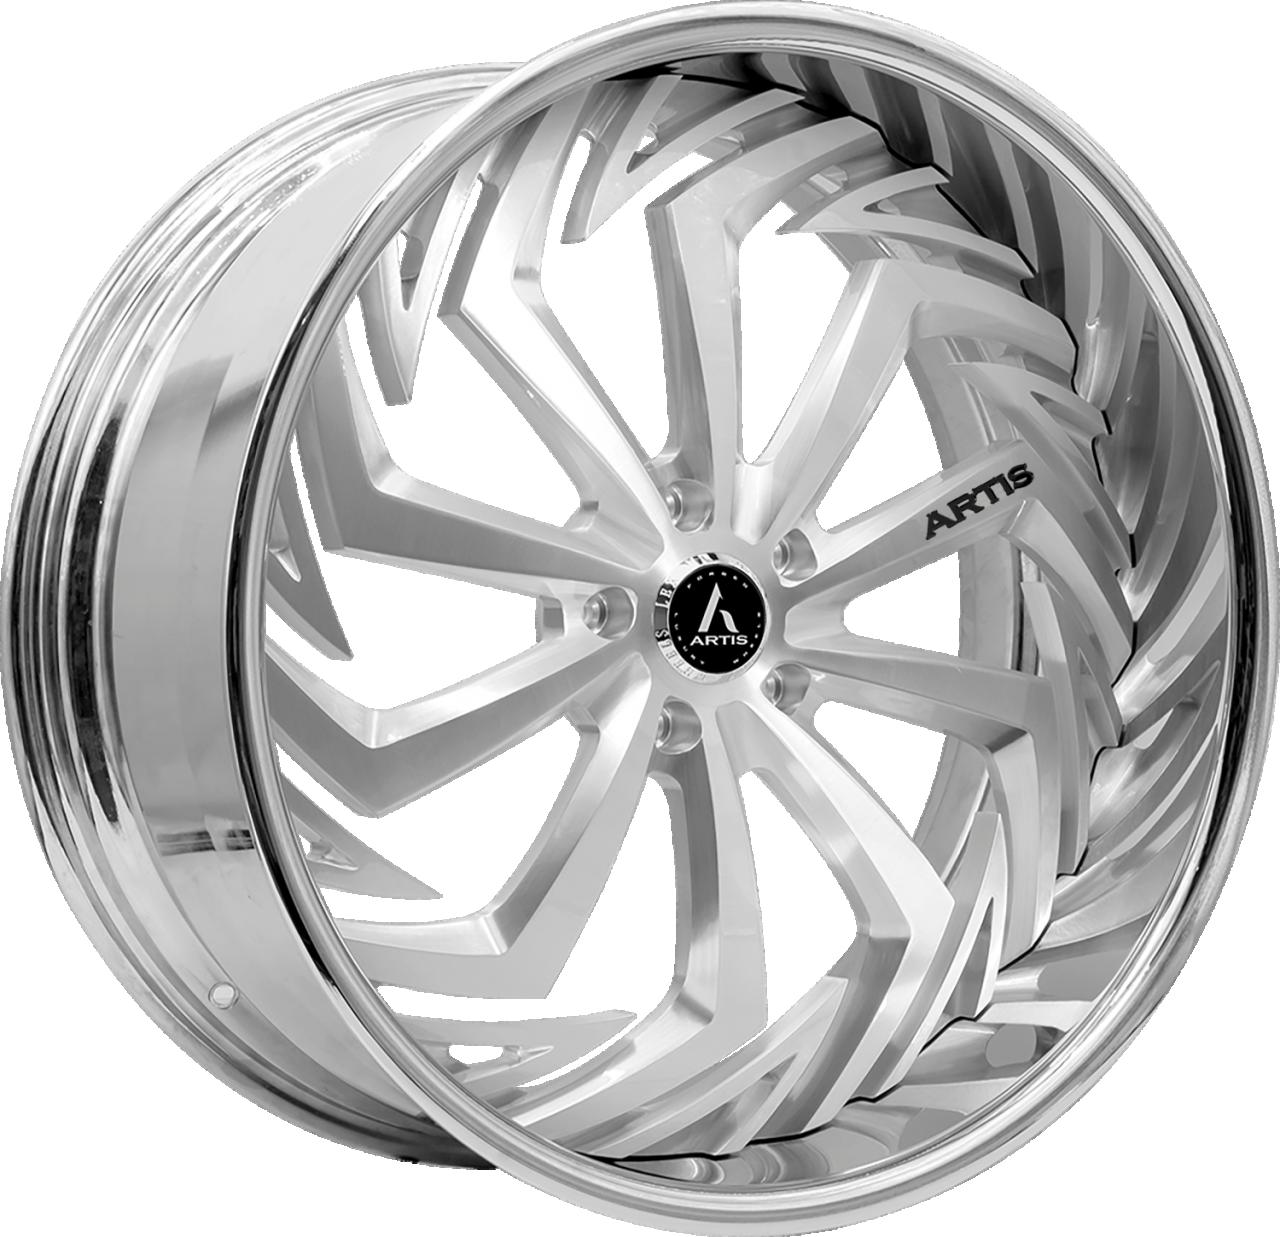 Artis Forged Royal wheel with Brushed finish